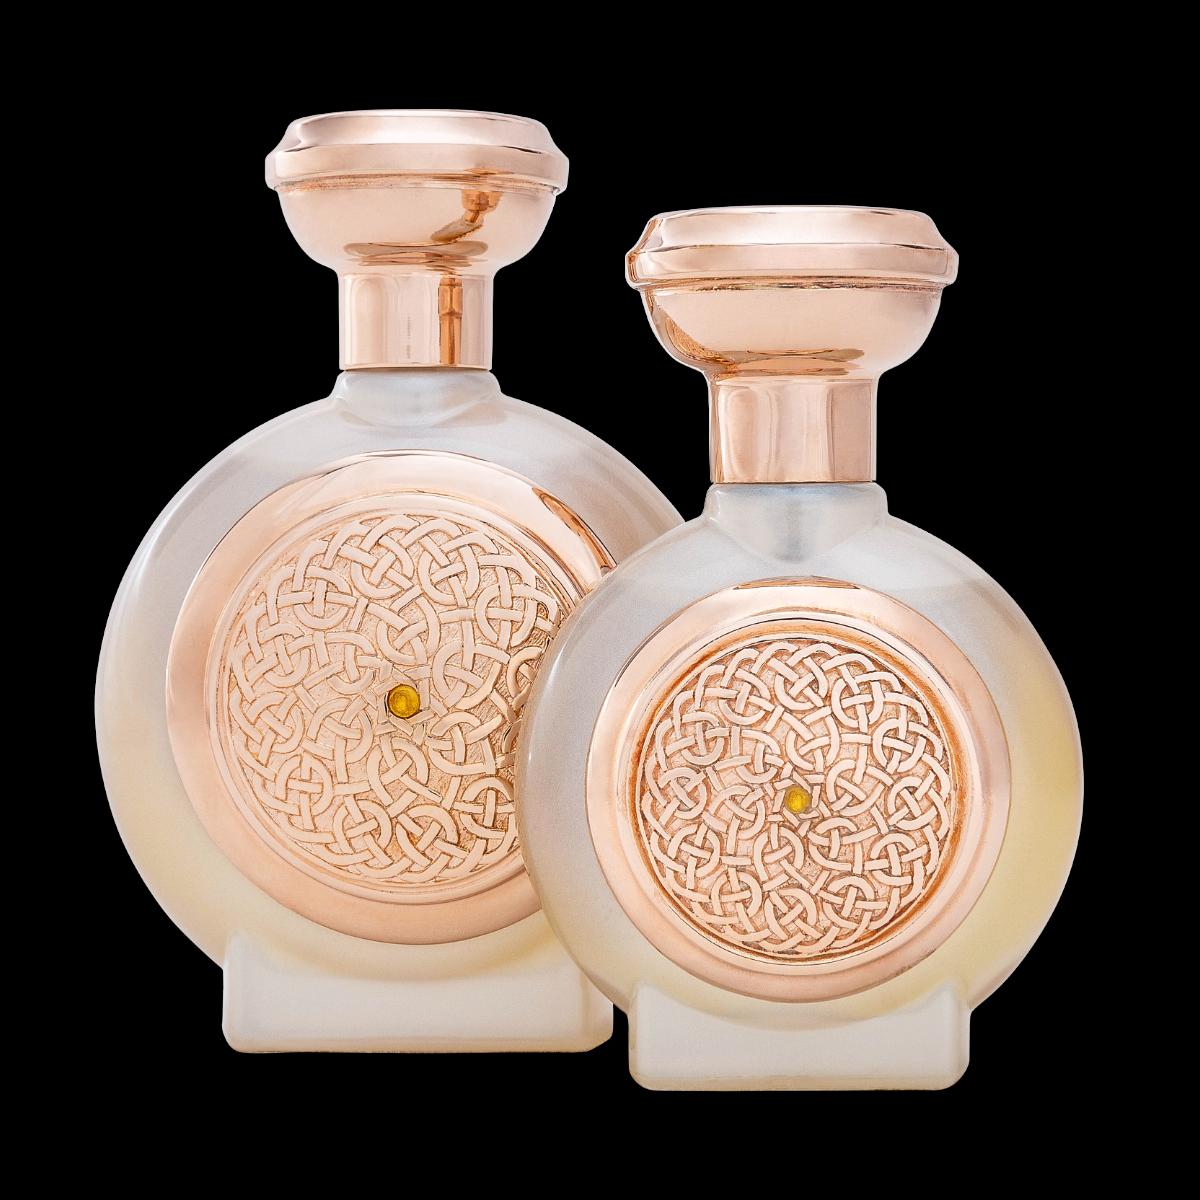 Amber Sapphire Duo bottle